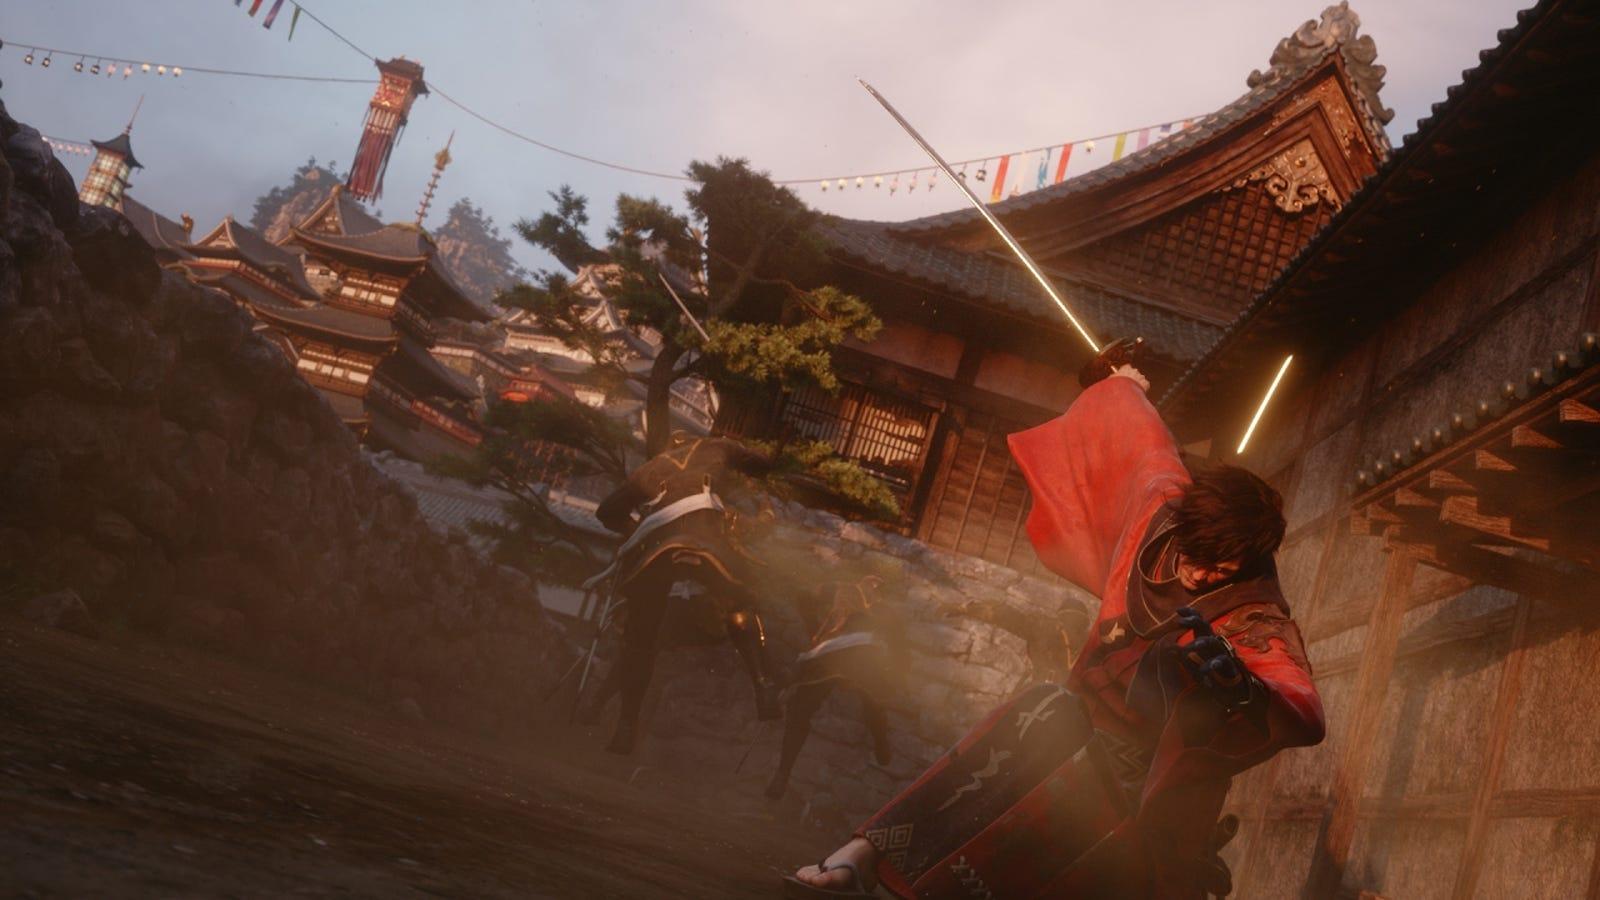 Unduh 67+ Wallpaper Ff Samurai Paling Keren